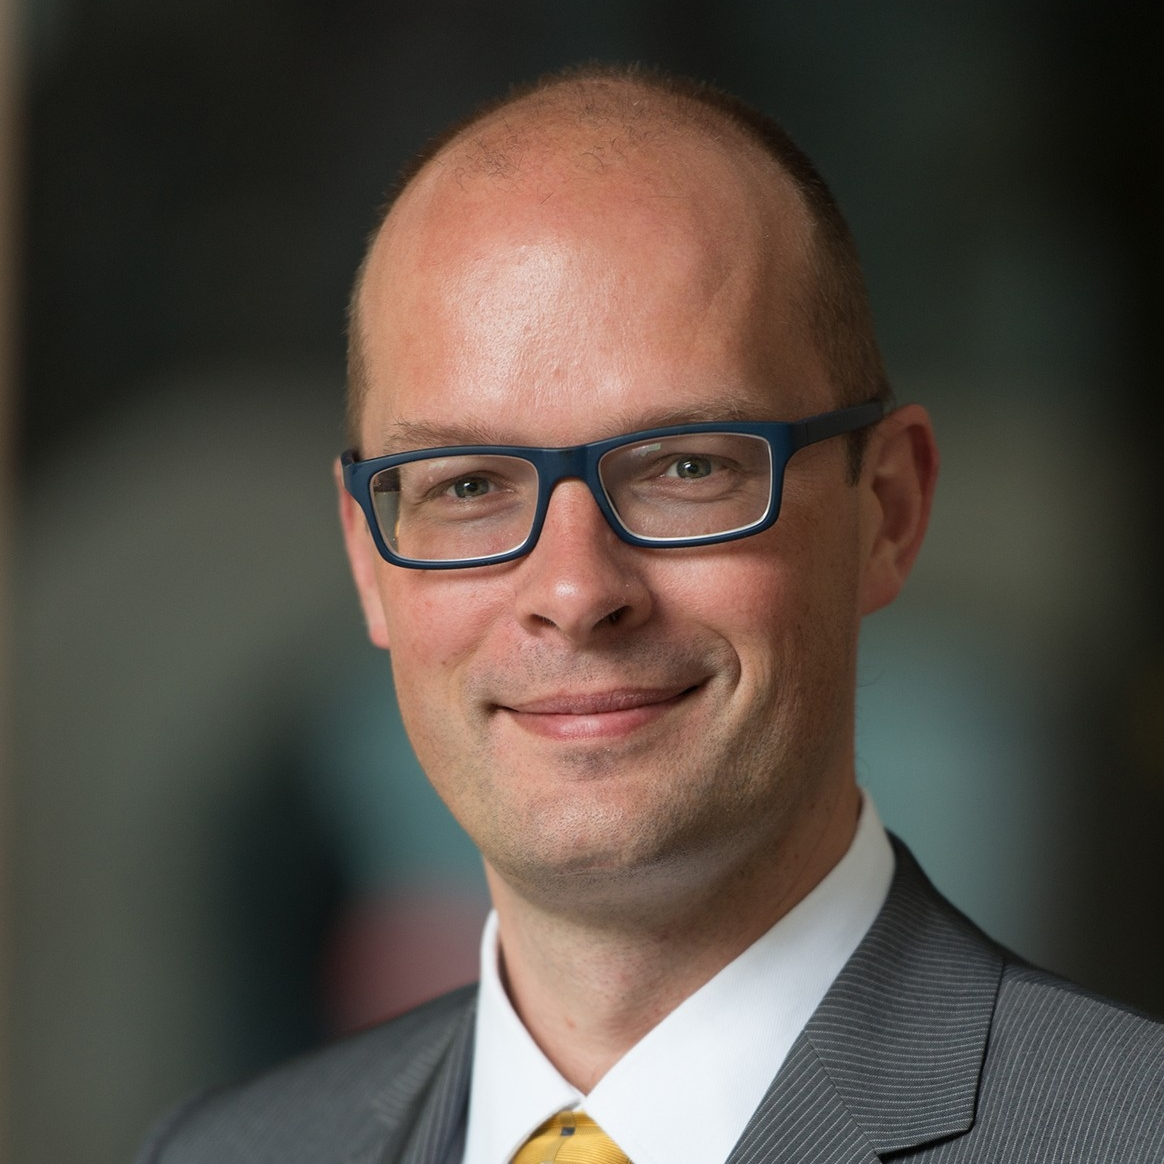 Deputy Mayor Jan Brink   City of Zwolle, The Netherlands